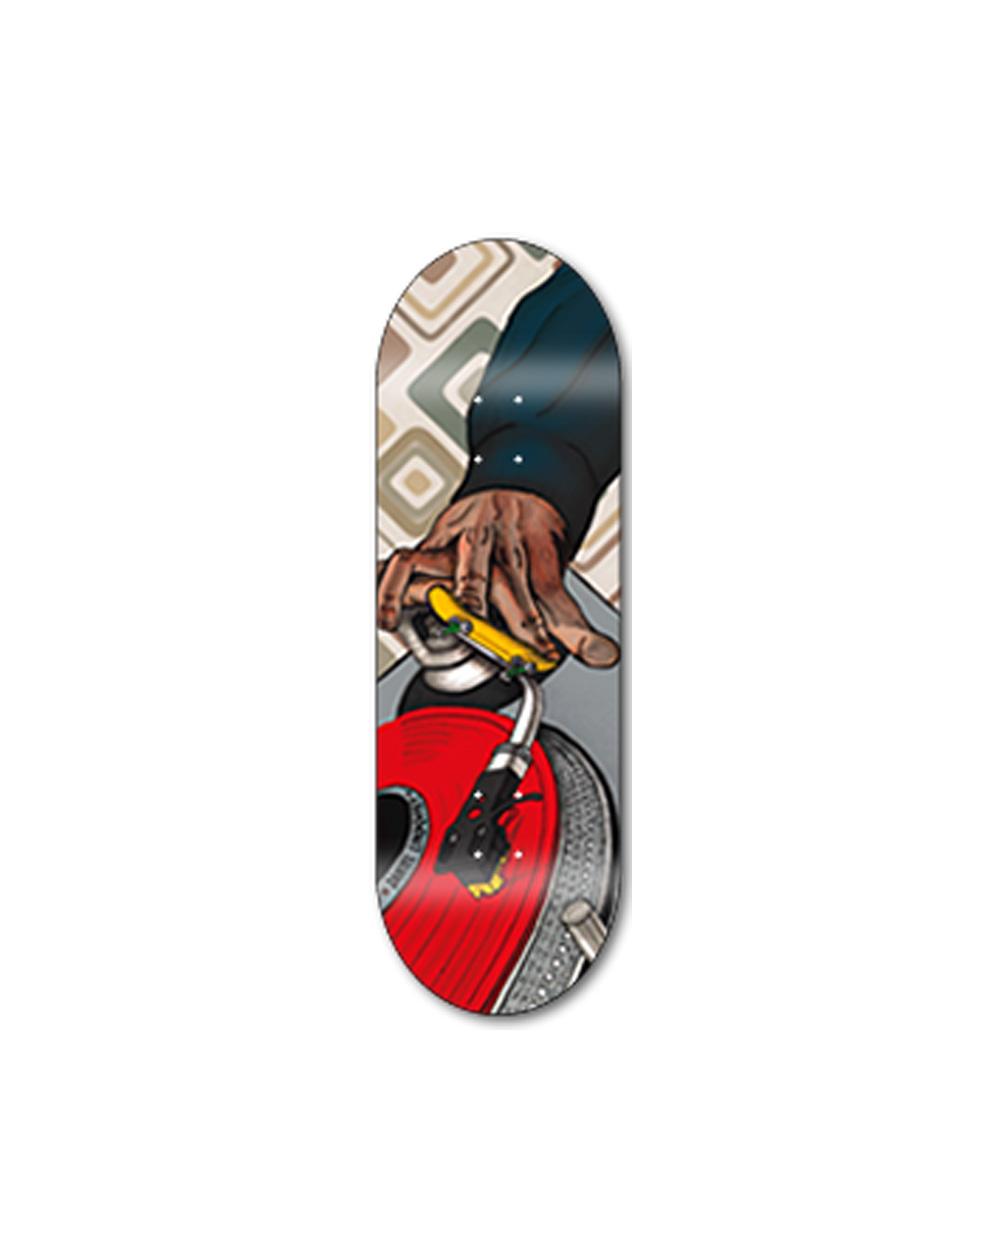 Yellowood Daniel Lindqvist Z3 Fingerboard Deck